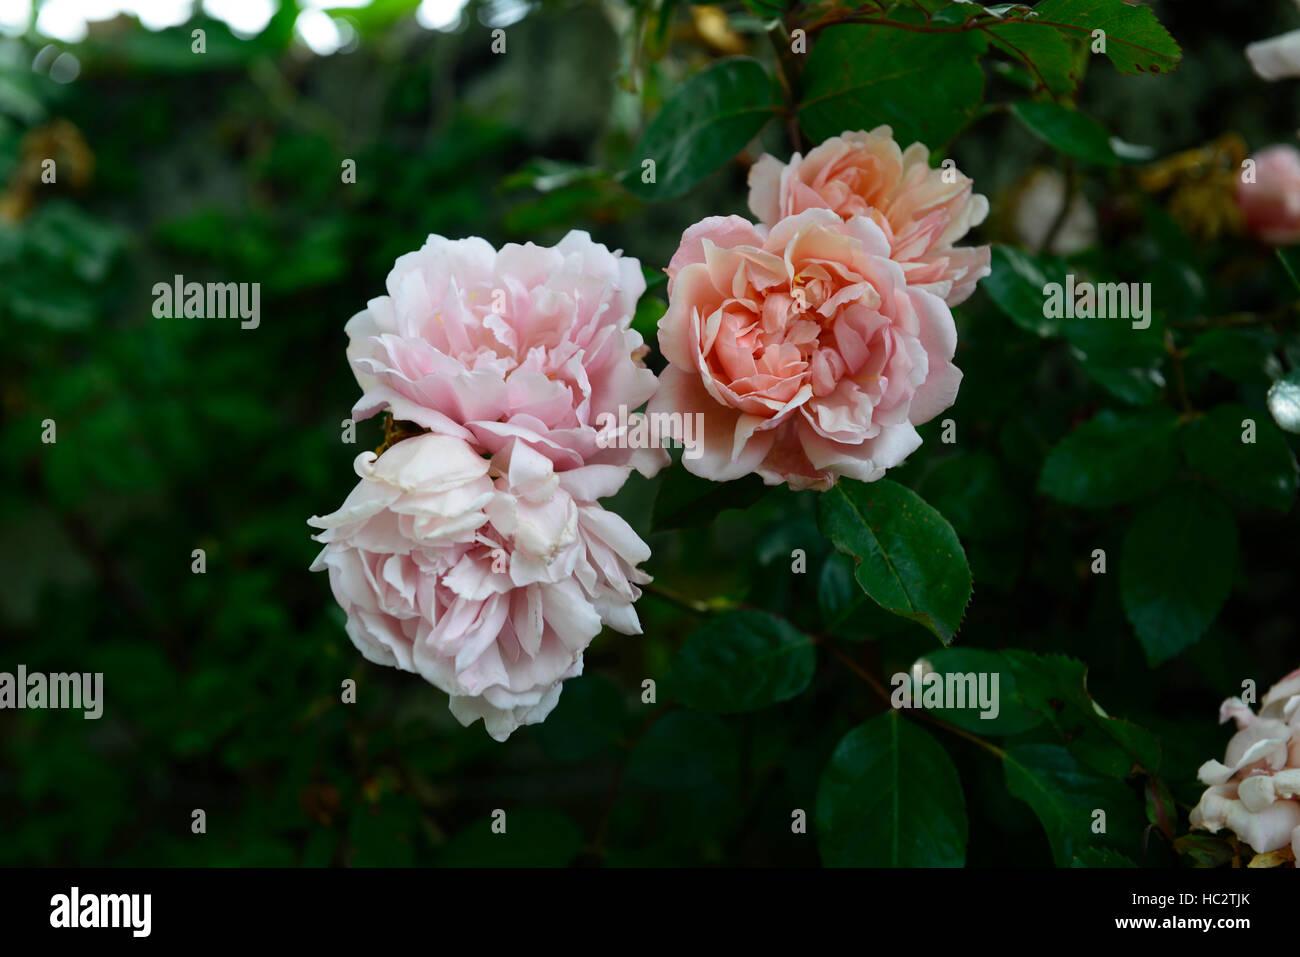 Rose Rampicanti Senza Spine thornless rose immagini & thornless rose fotos stock - alamy